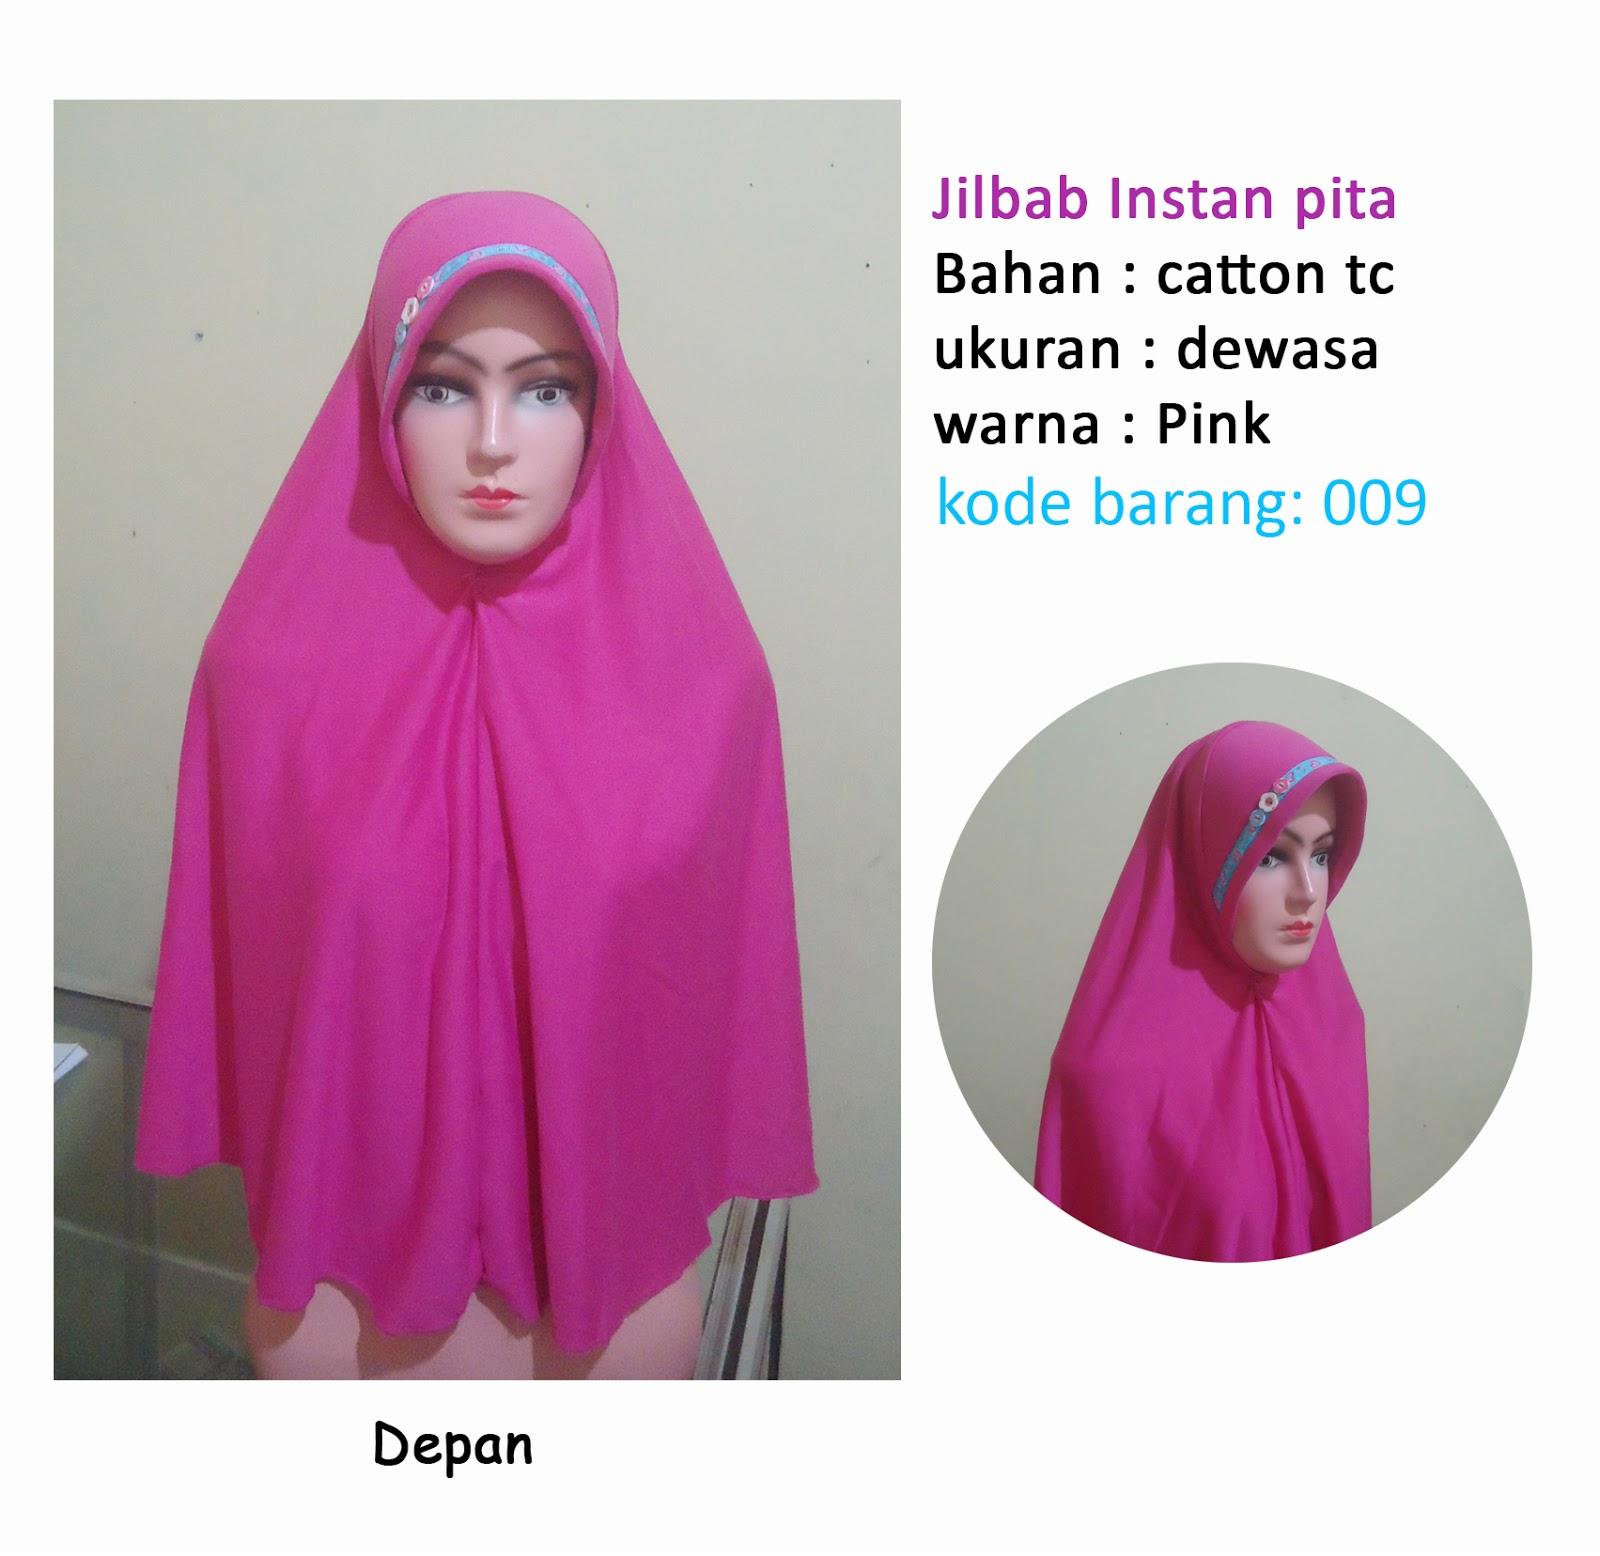 Jilbab Syari Instan Pita Depan Selain Kami Melayani Juga Agen Distributor Grosir Segi Empat Umama Bolak Balik Bergo